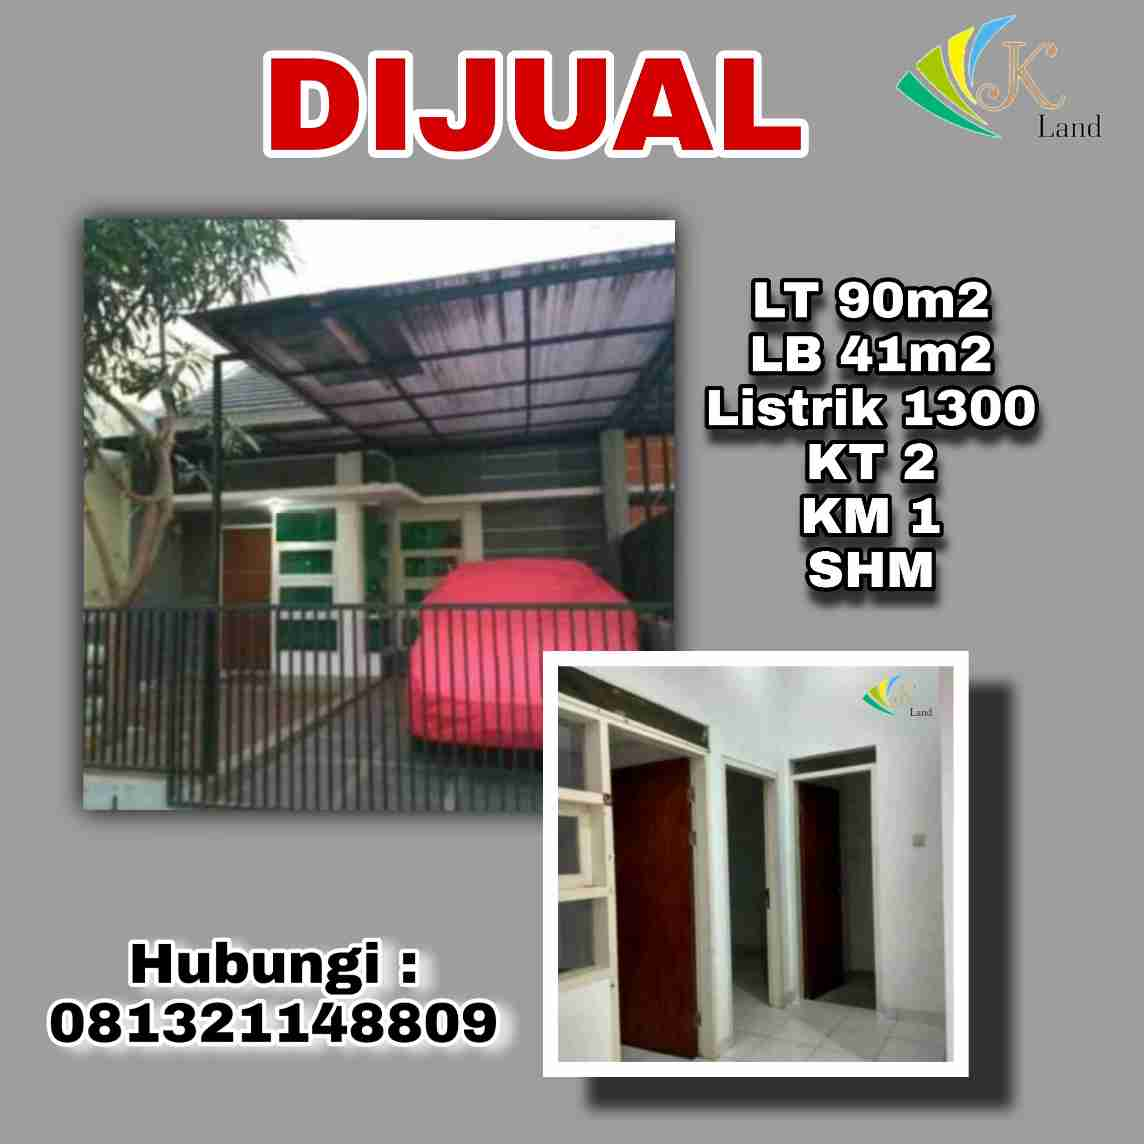 Dijual Rumah Di Ciwastra Bandung